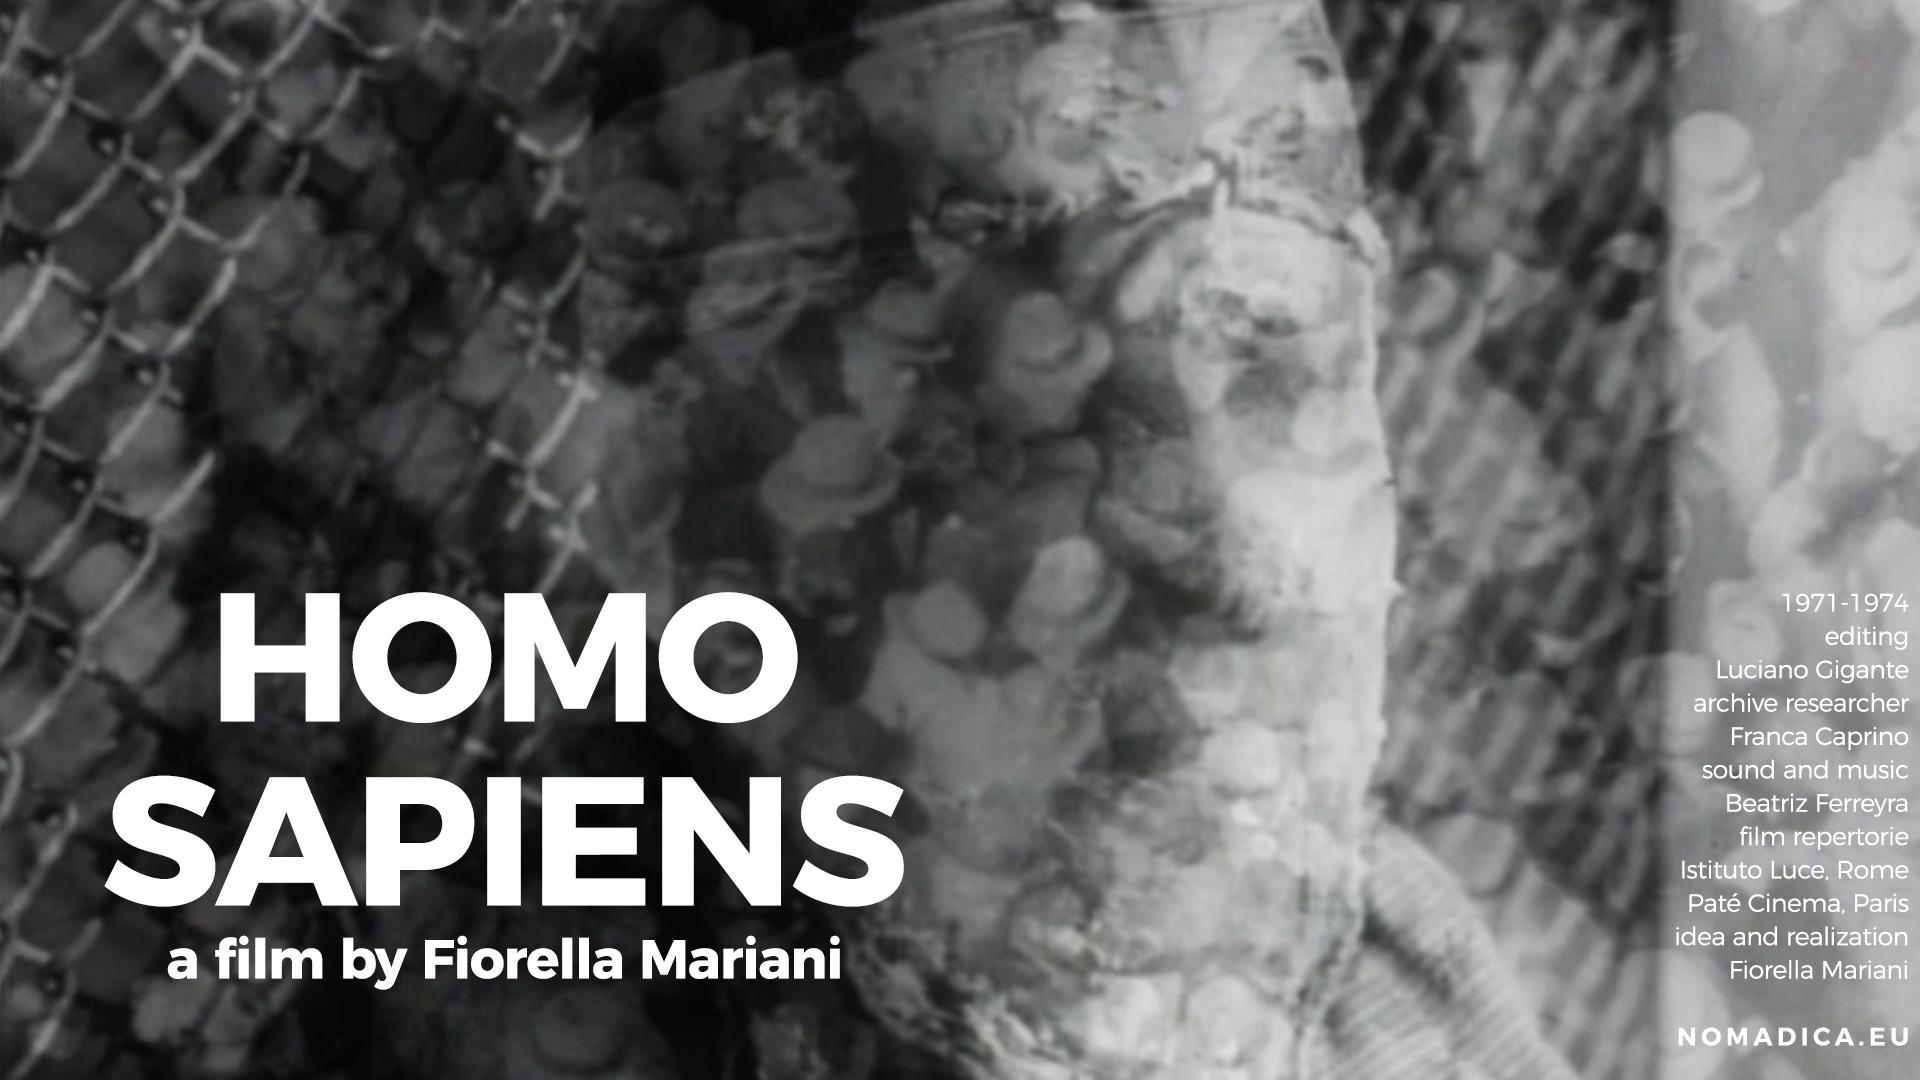 Homo sapiens, a film by Fiorella Mariani (open distribution)